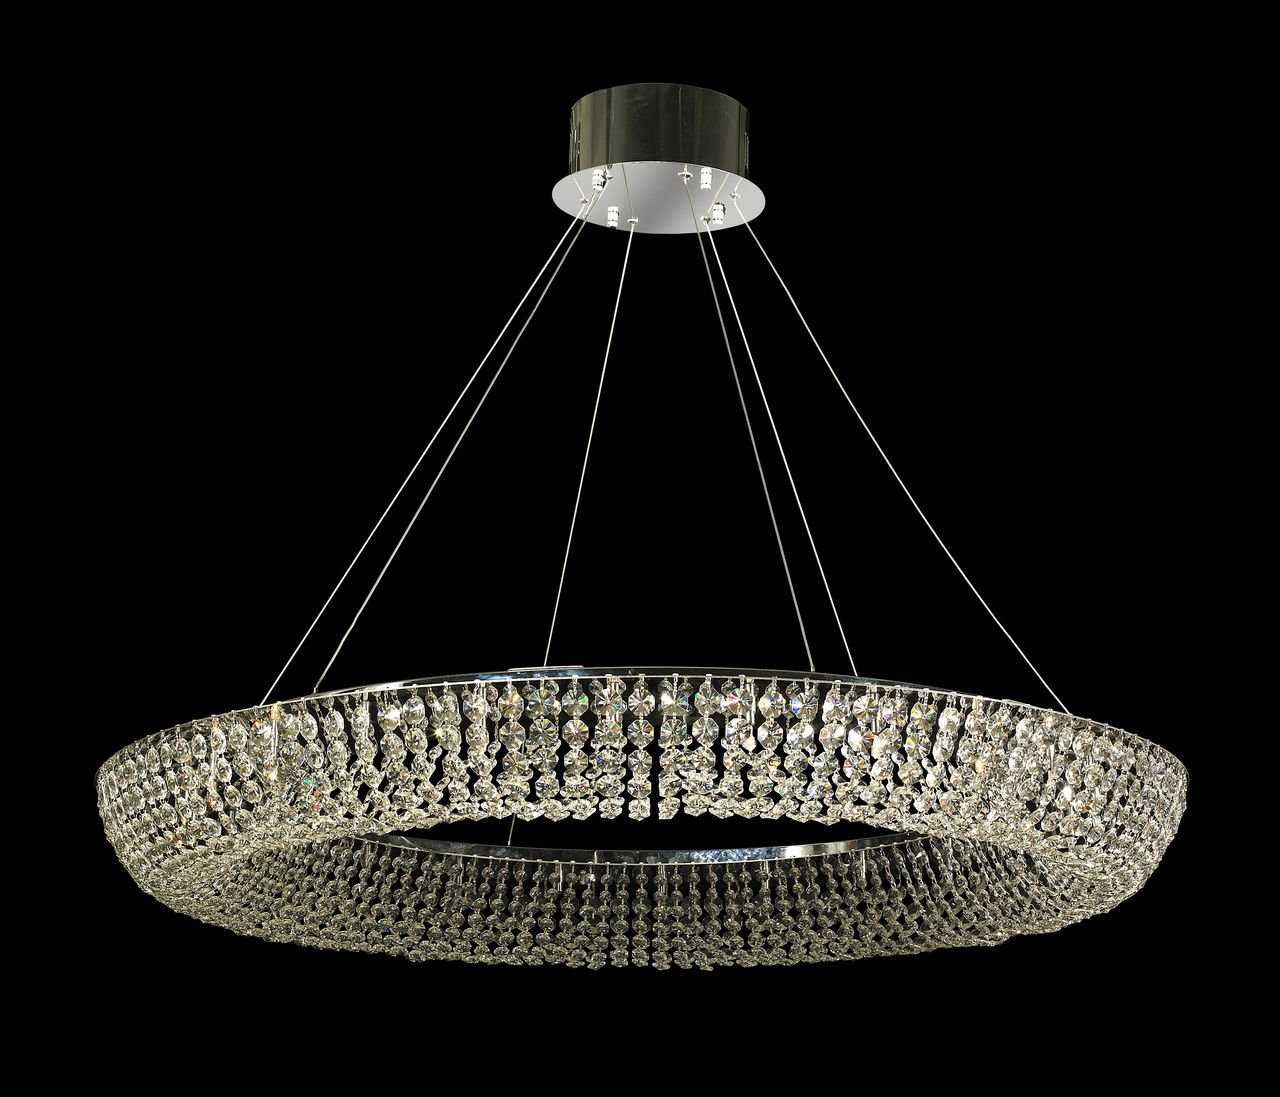 new alibaba com modern designer from large group aliexpress chandelier mount design on chandeliers flush lamp room lustre sale lighting in item crystal lights living ceiling